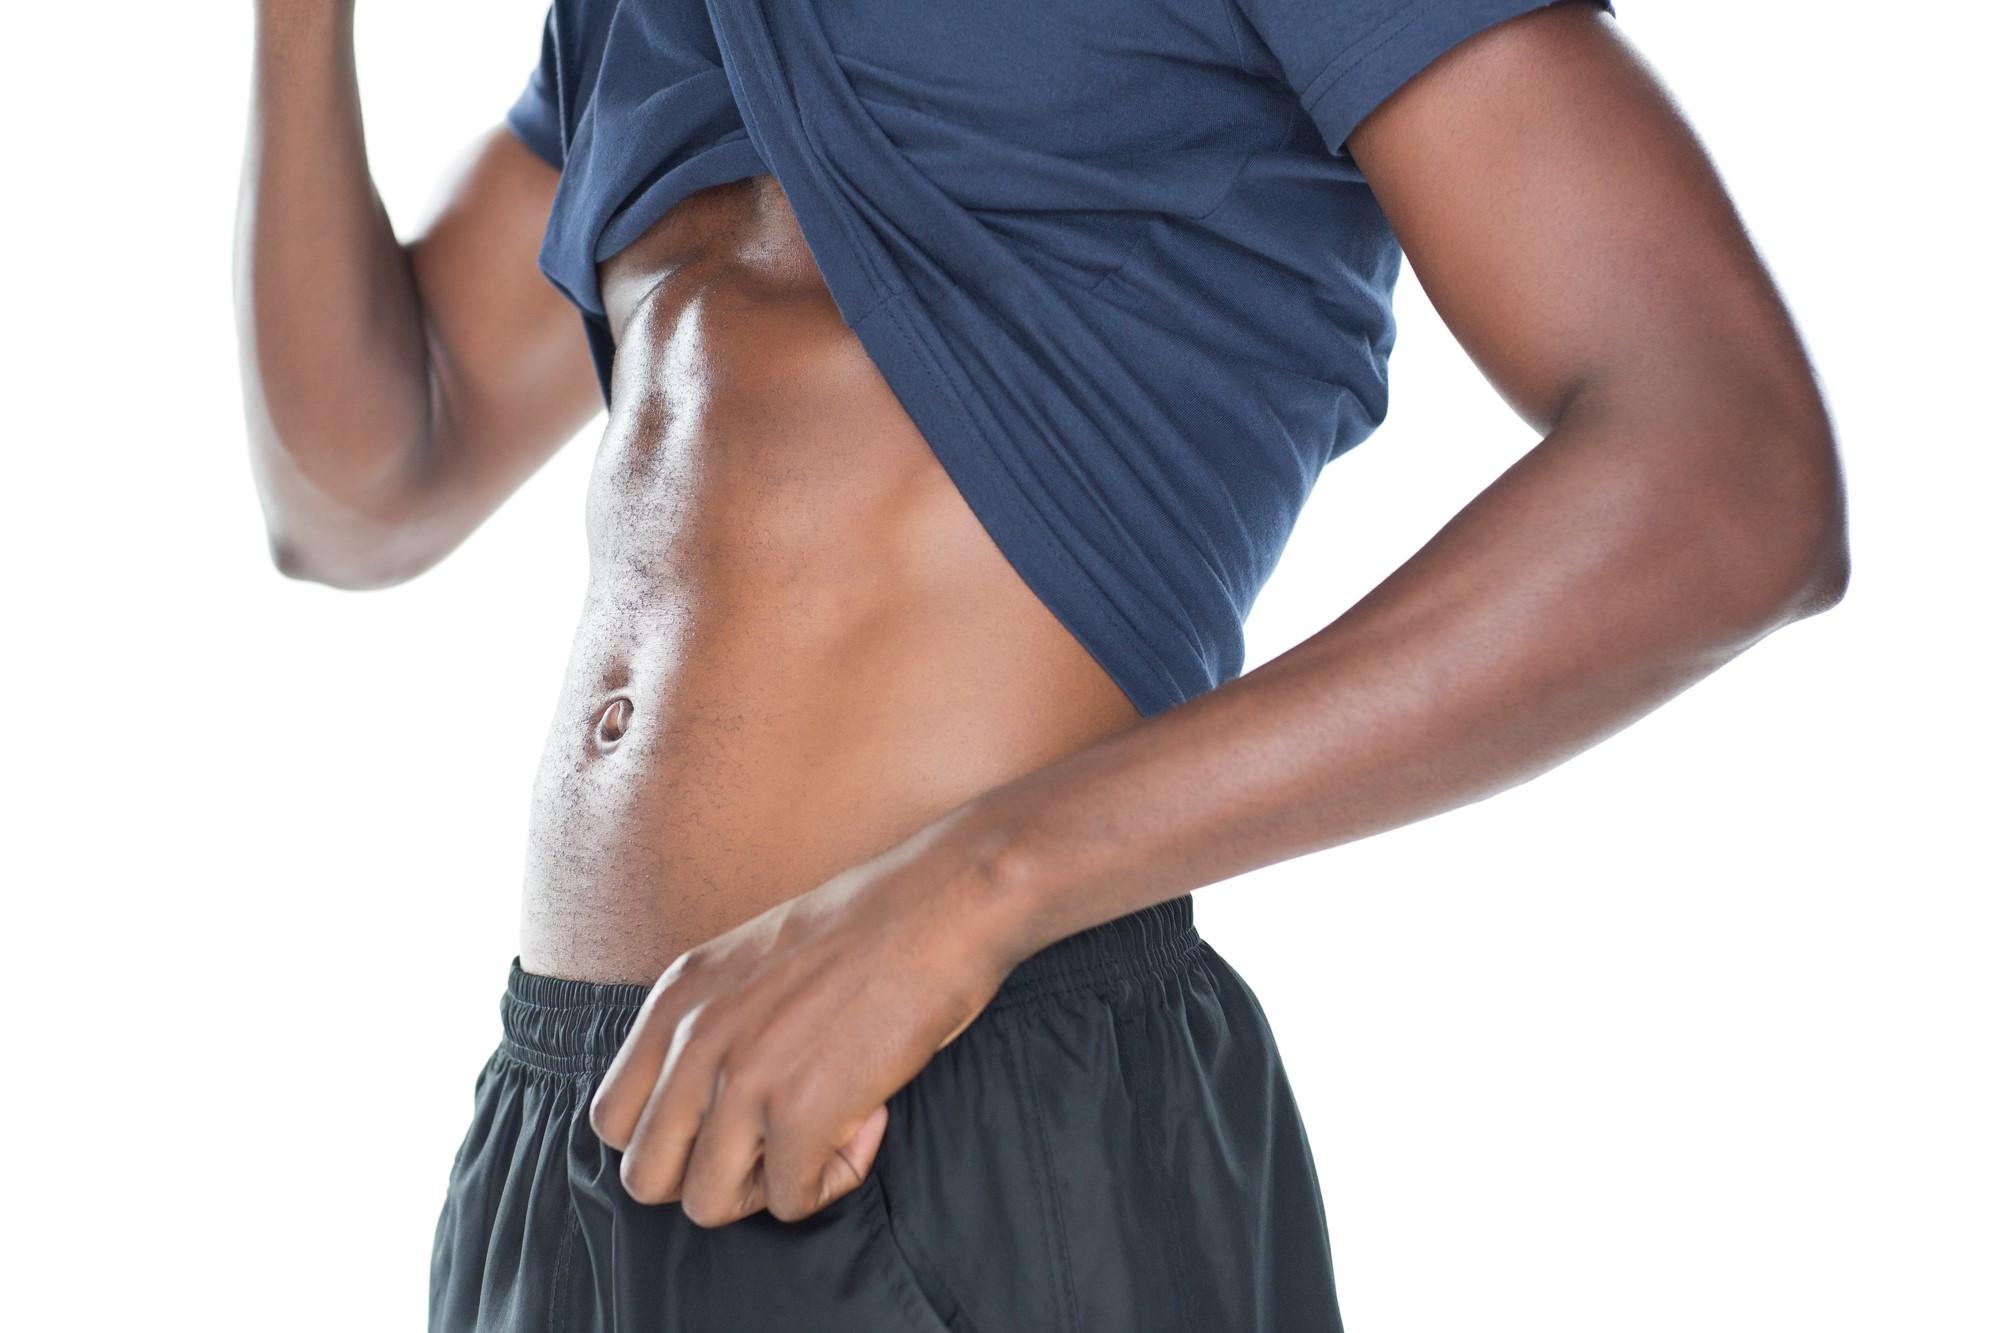 Tenir uns abdominals marcats en 20 dies